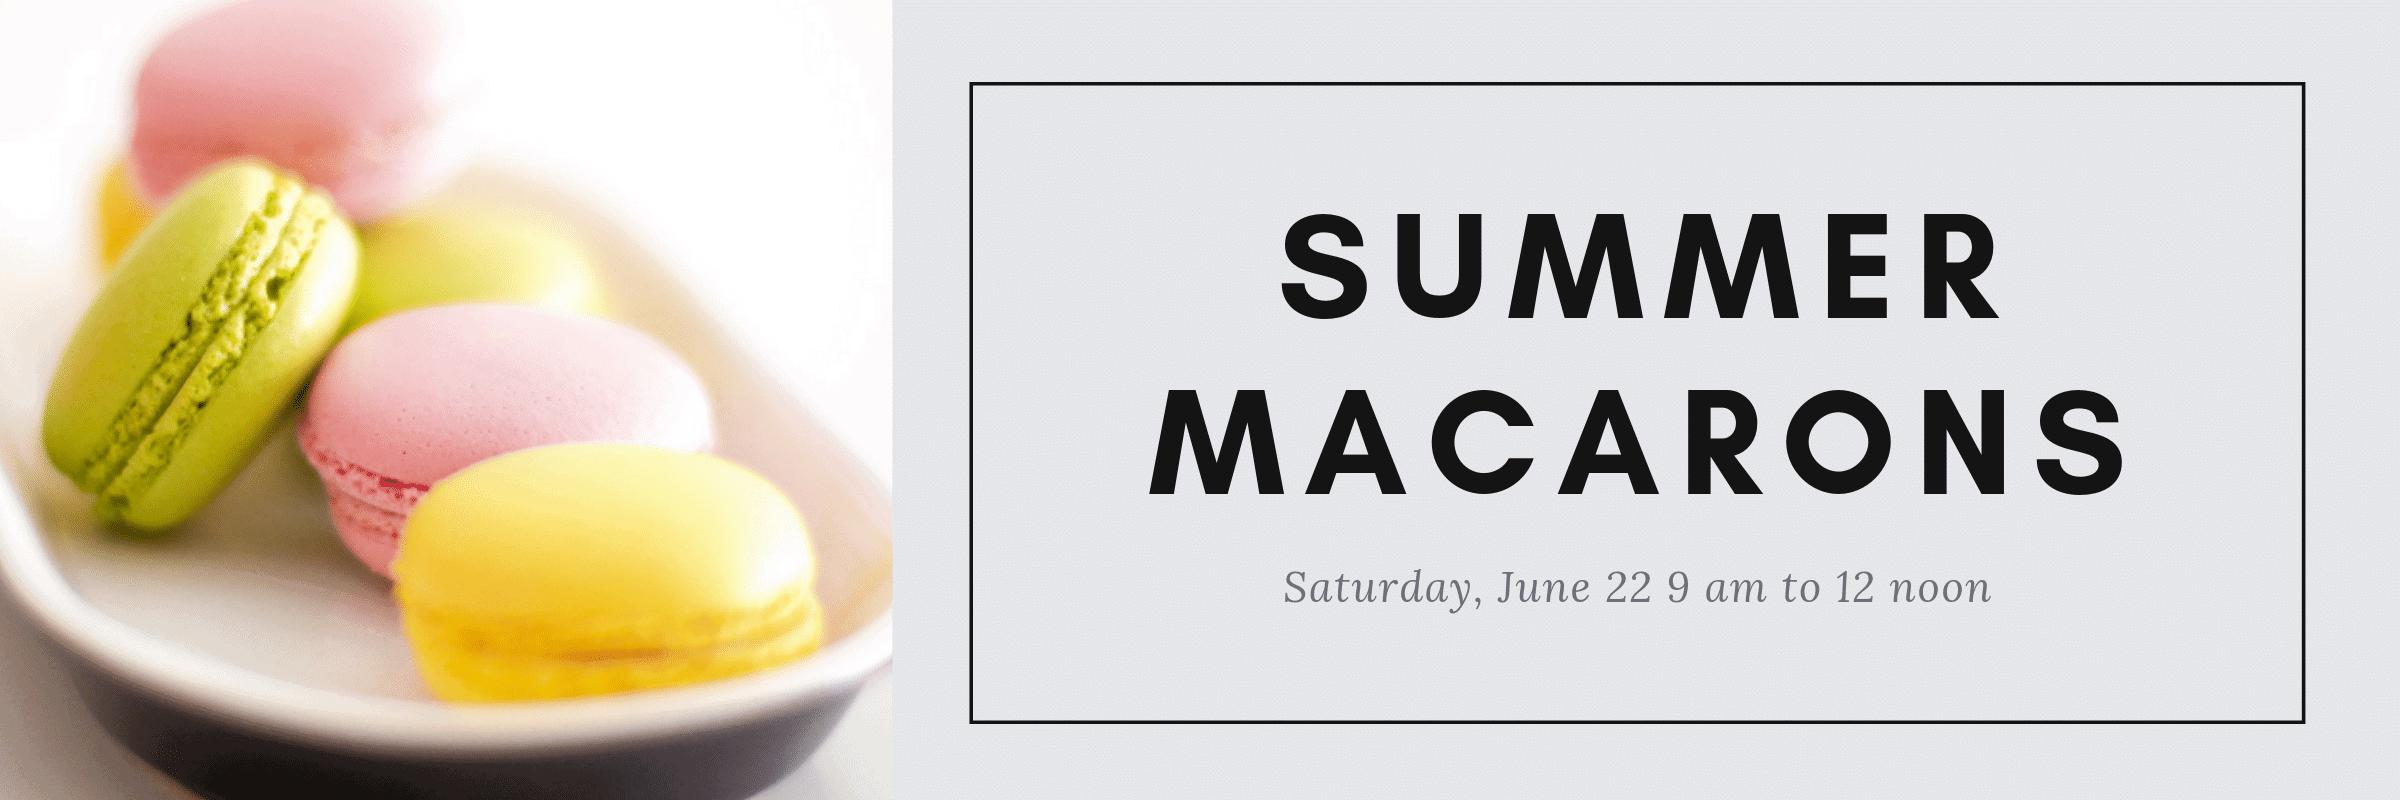 Summer Macarons (1)